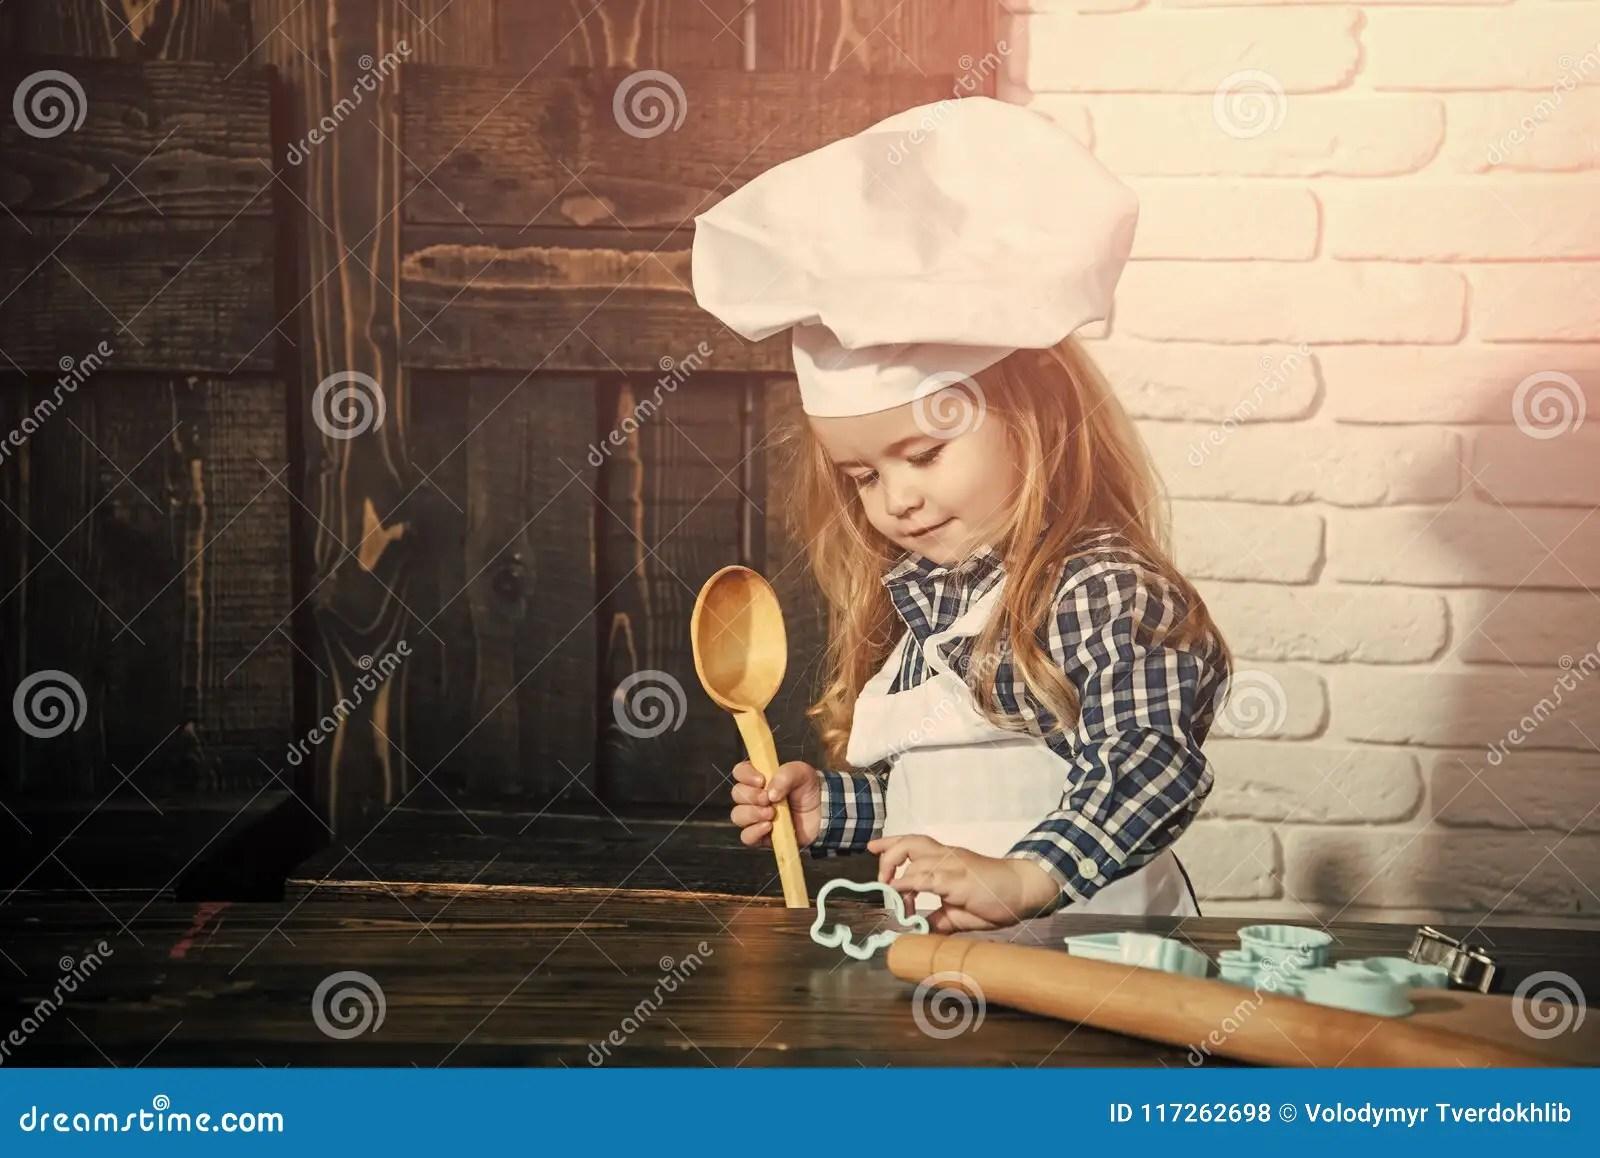 kitchen apron for kids high back sink 获得愉快的孩子乐趣厨师帽子的男孩厨师和围裙在厨房里库存照片 图片包括 获得愉快的孩子乐趣厨师帽子的男孩厨师和围裙在厨房里